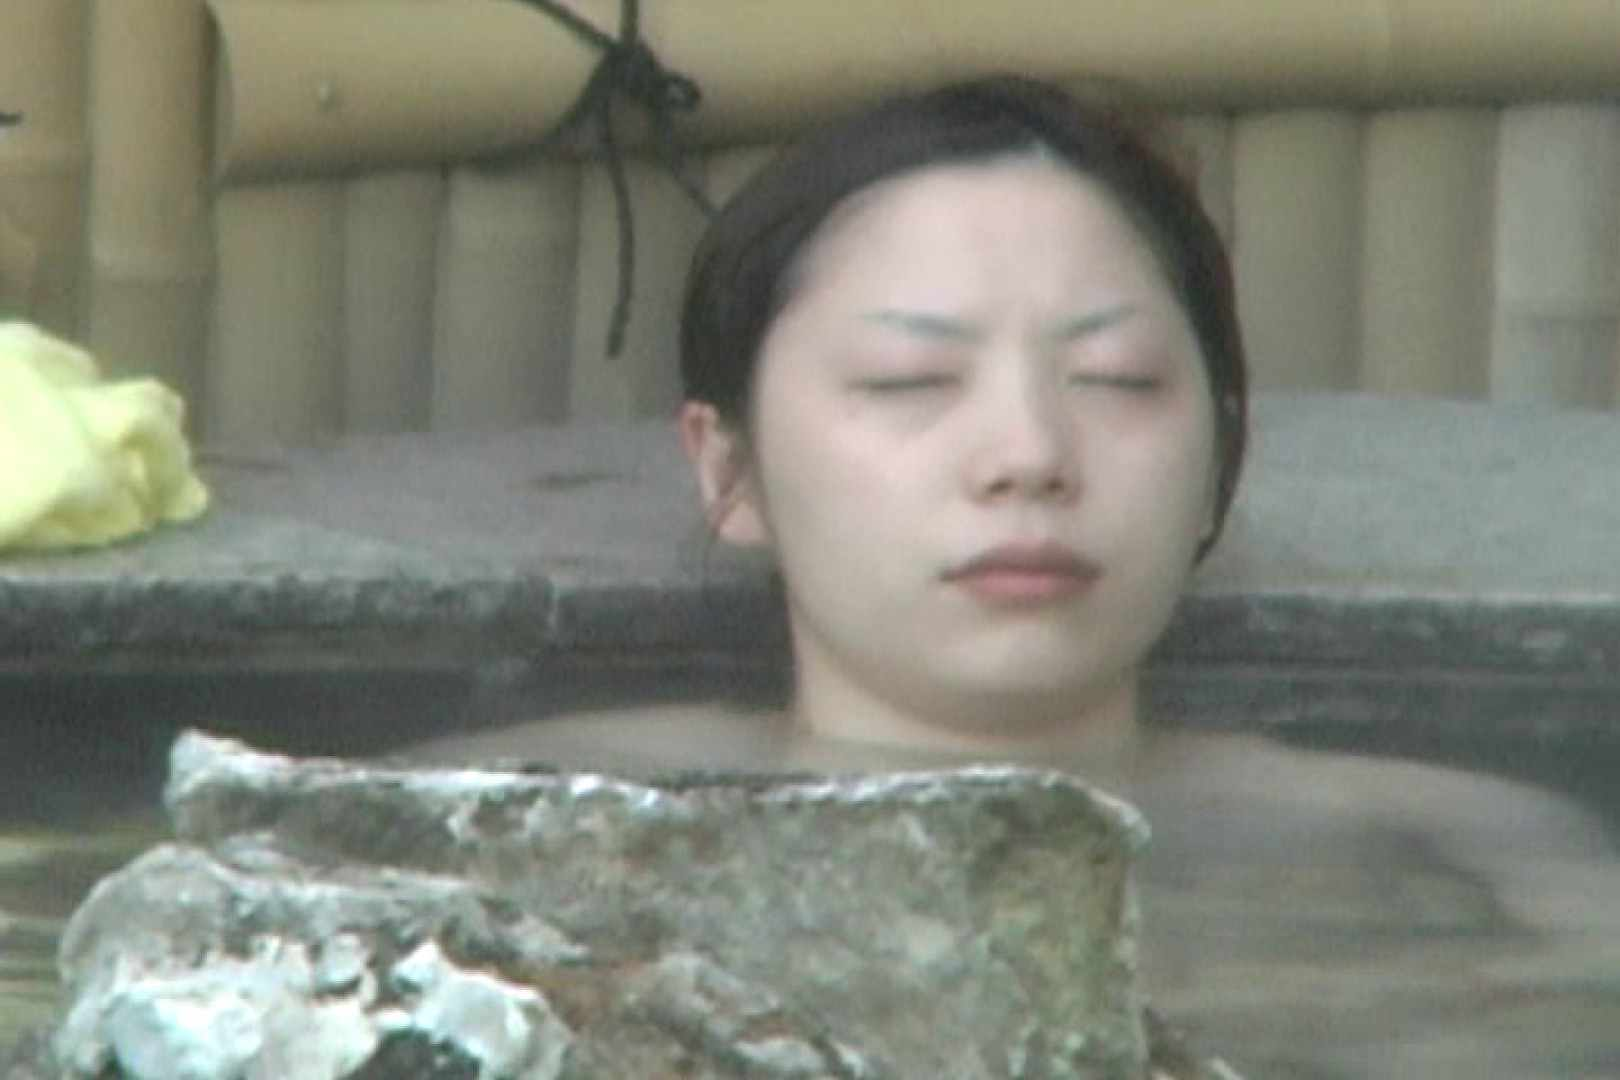 Aquaな露天風呂Vol.596 露天 覗きおまんこ画像 77画像 47